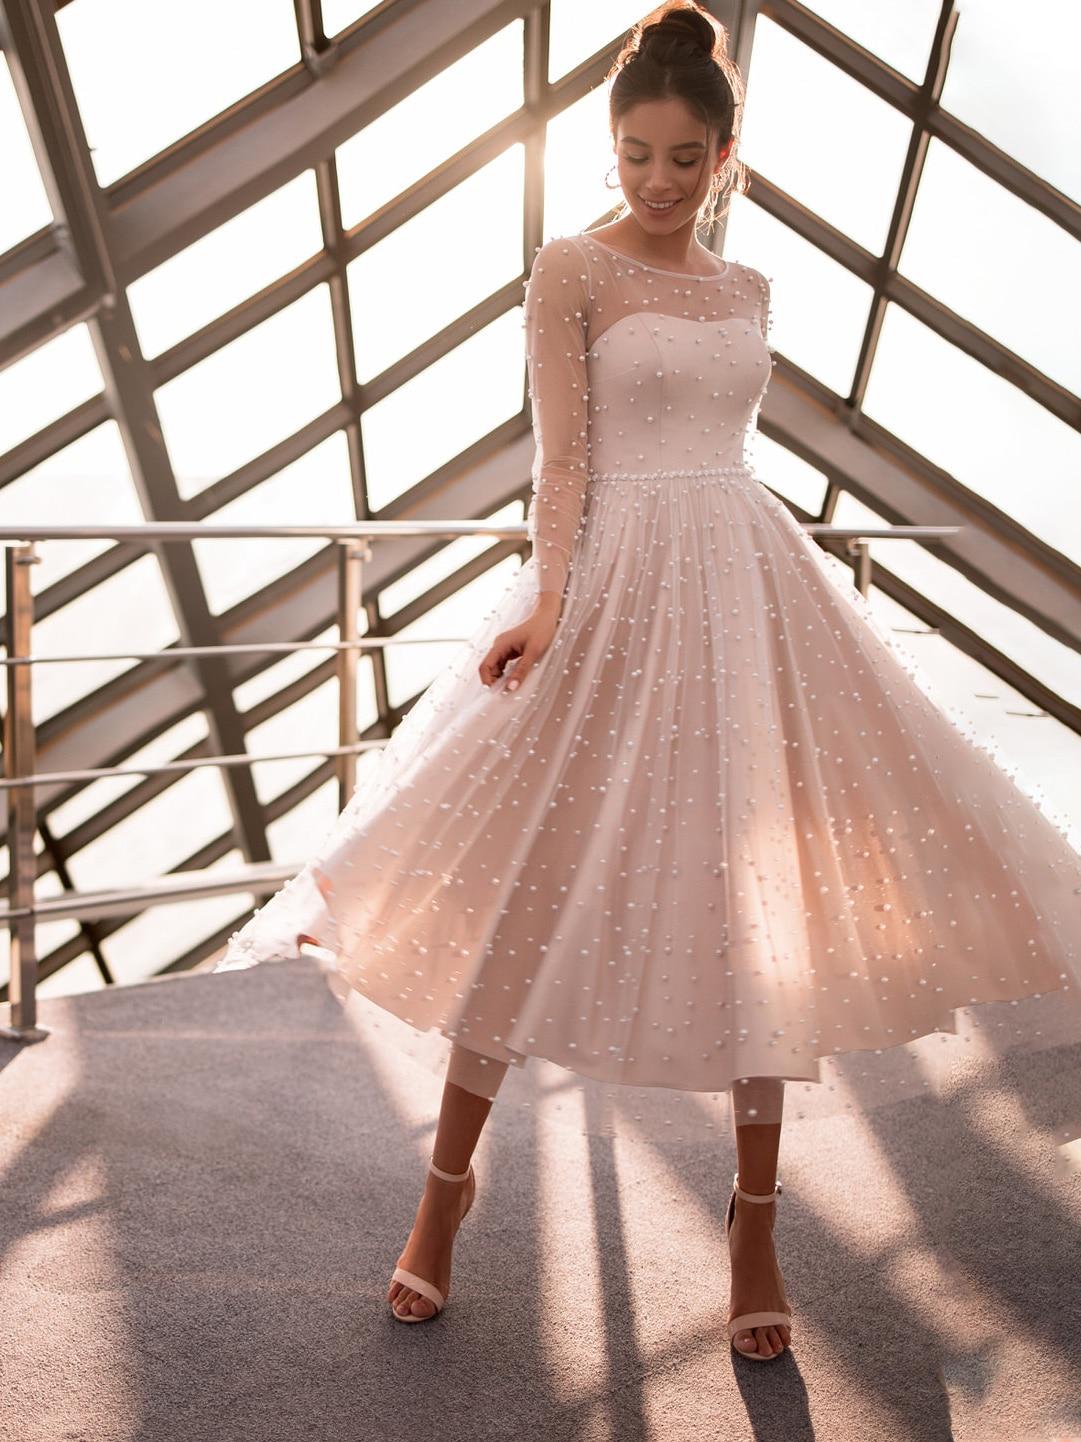 tea-length-pearls-scoop-neck-wedding-bridesmaid-dress-custom-made-2021-illusion-back-long-sleeves-ball-gowns-vestido-de-noiva